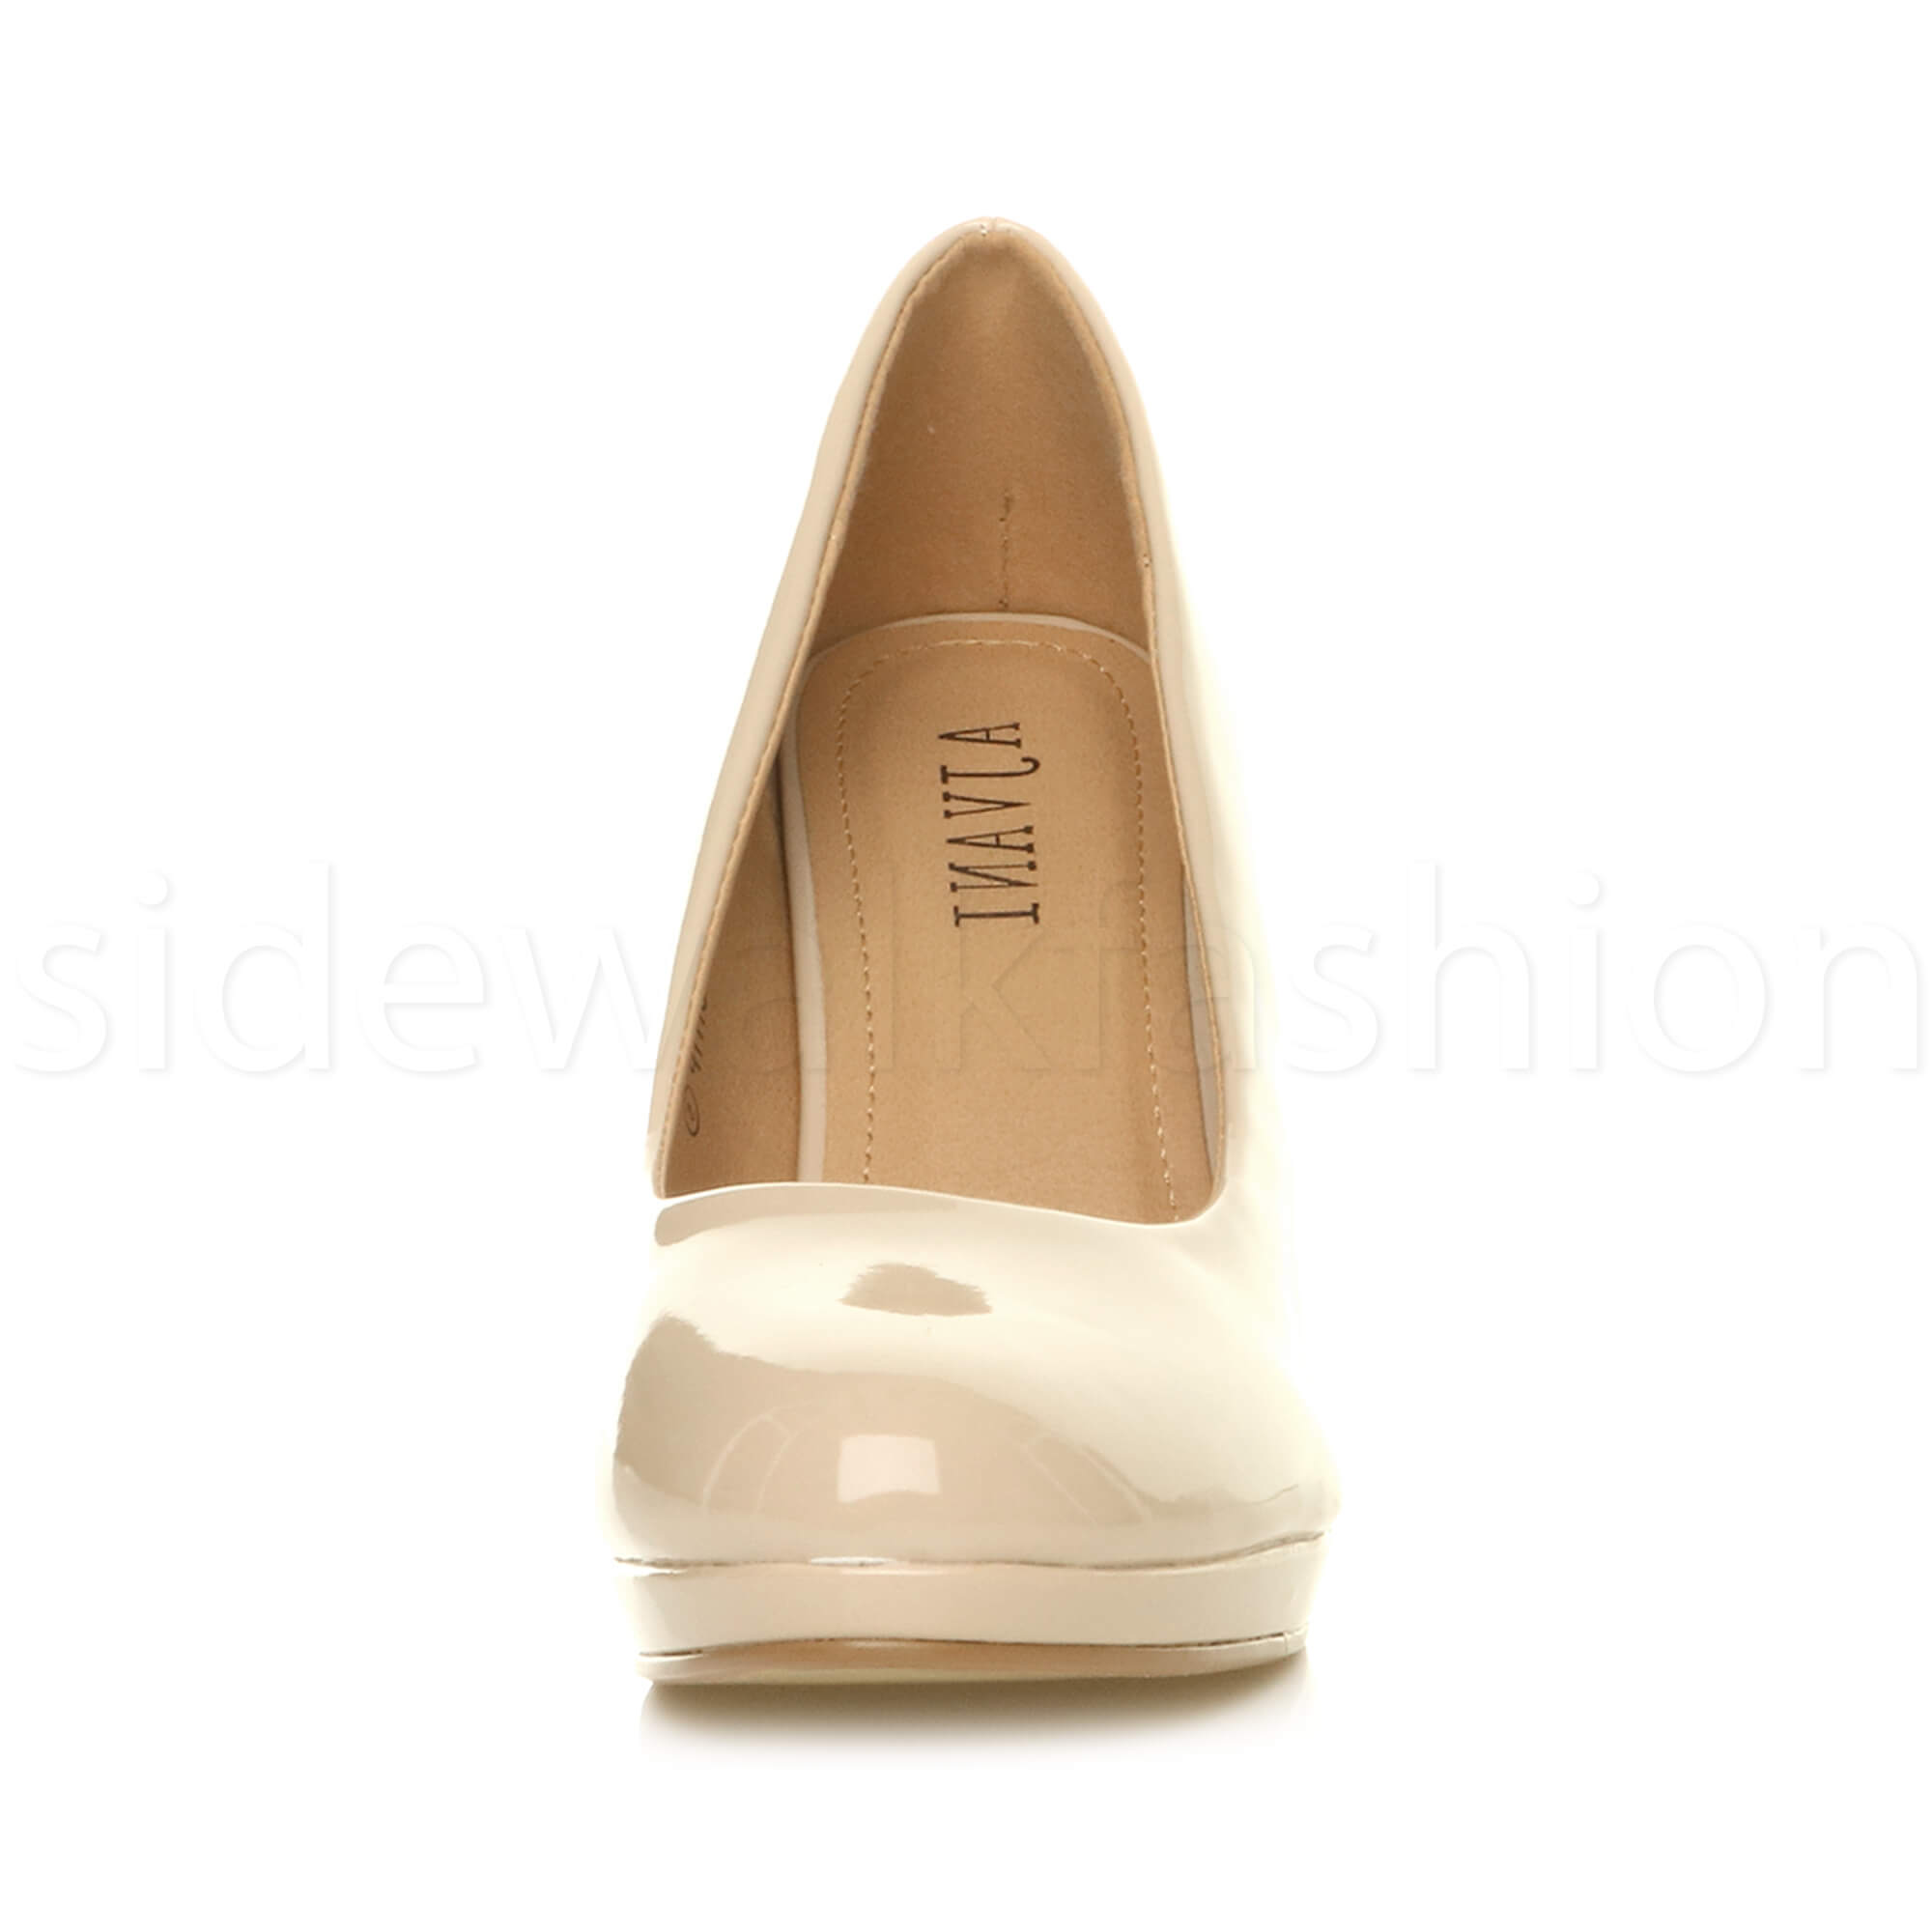 Womens-ladies-high-mid-heel-platform-wedding-evening-bridesmaid-court-shoes-size thumbnail 125